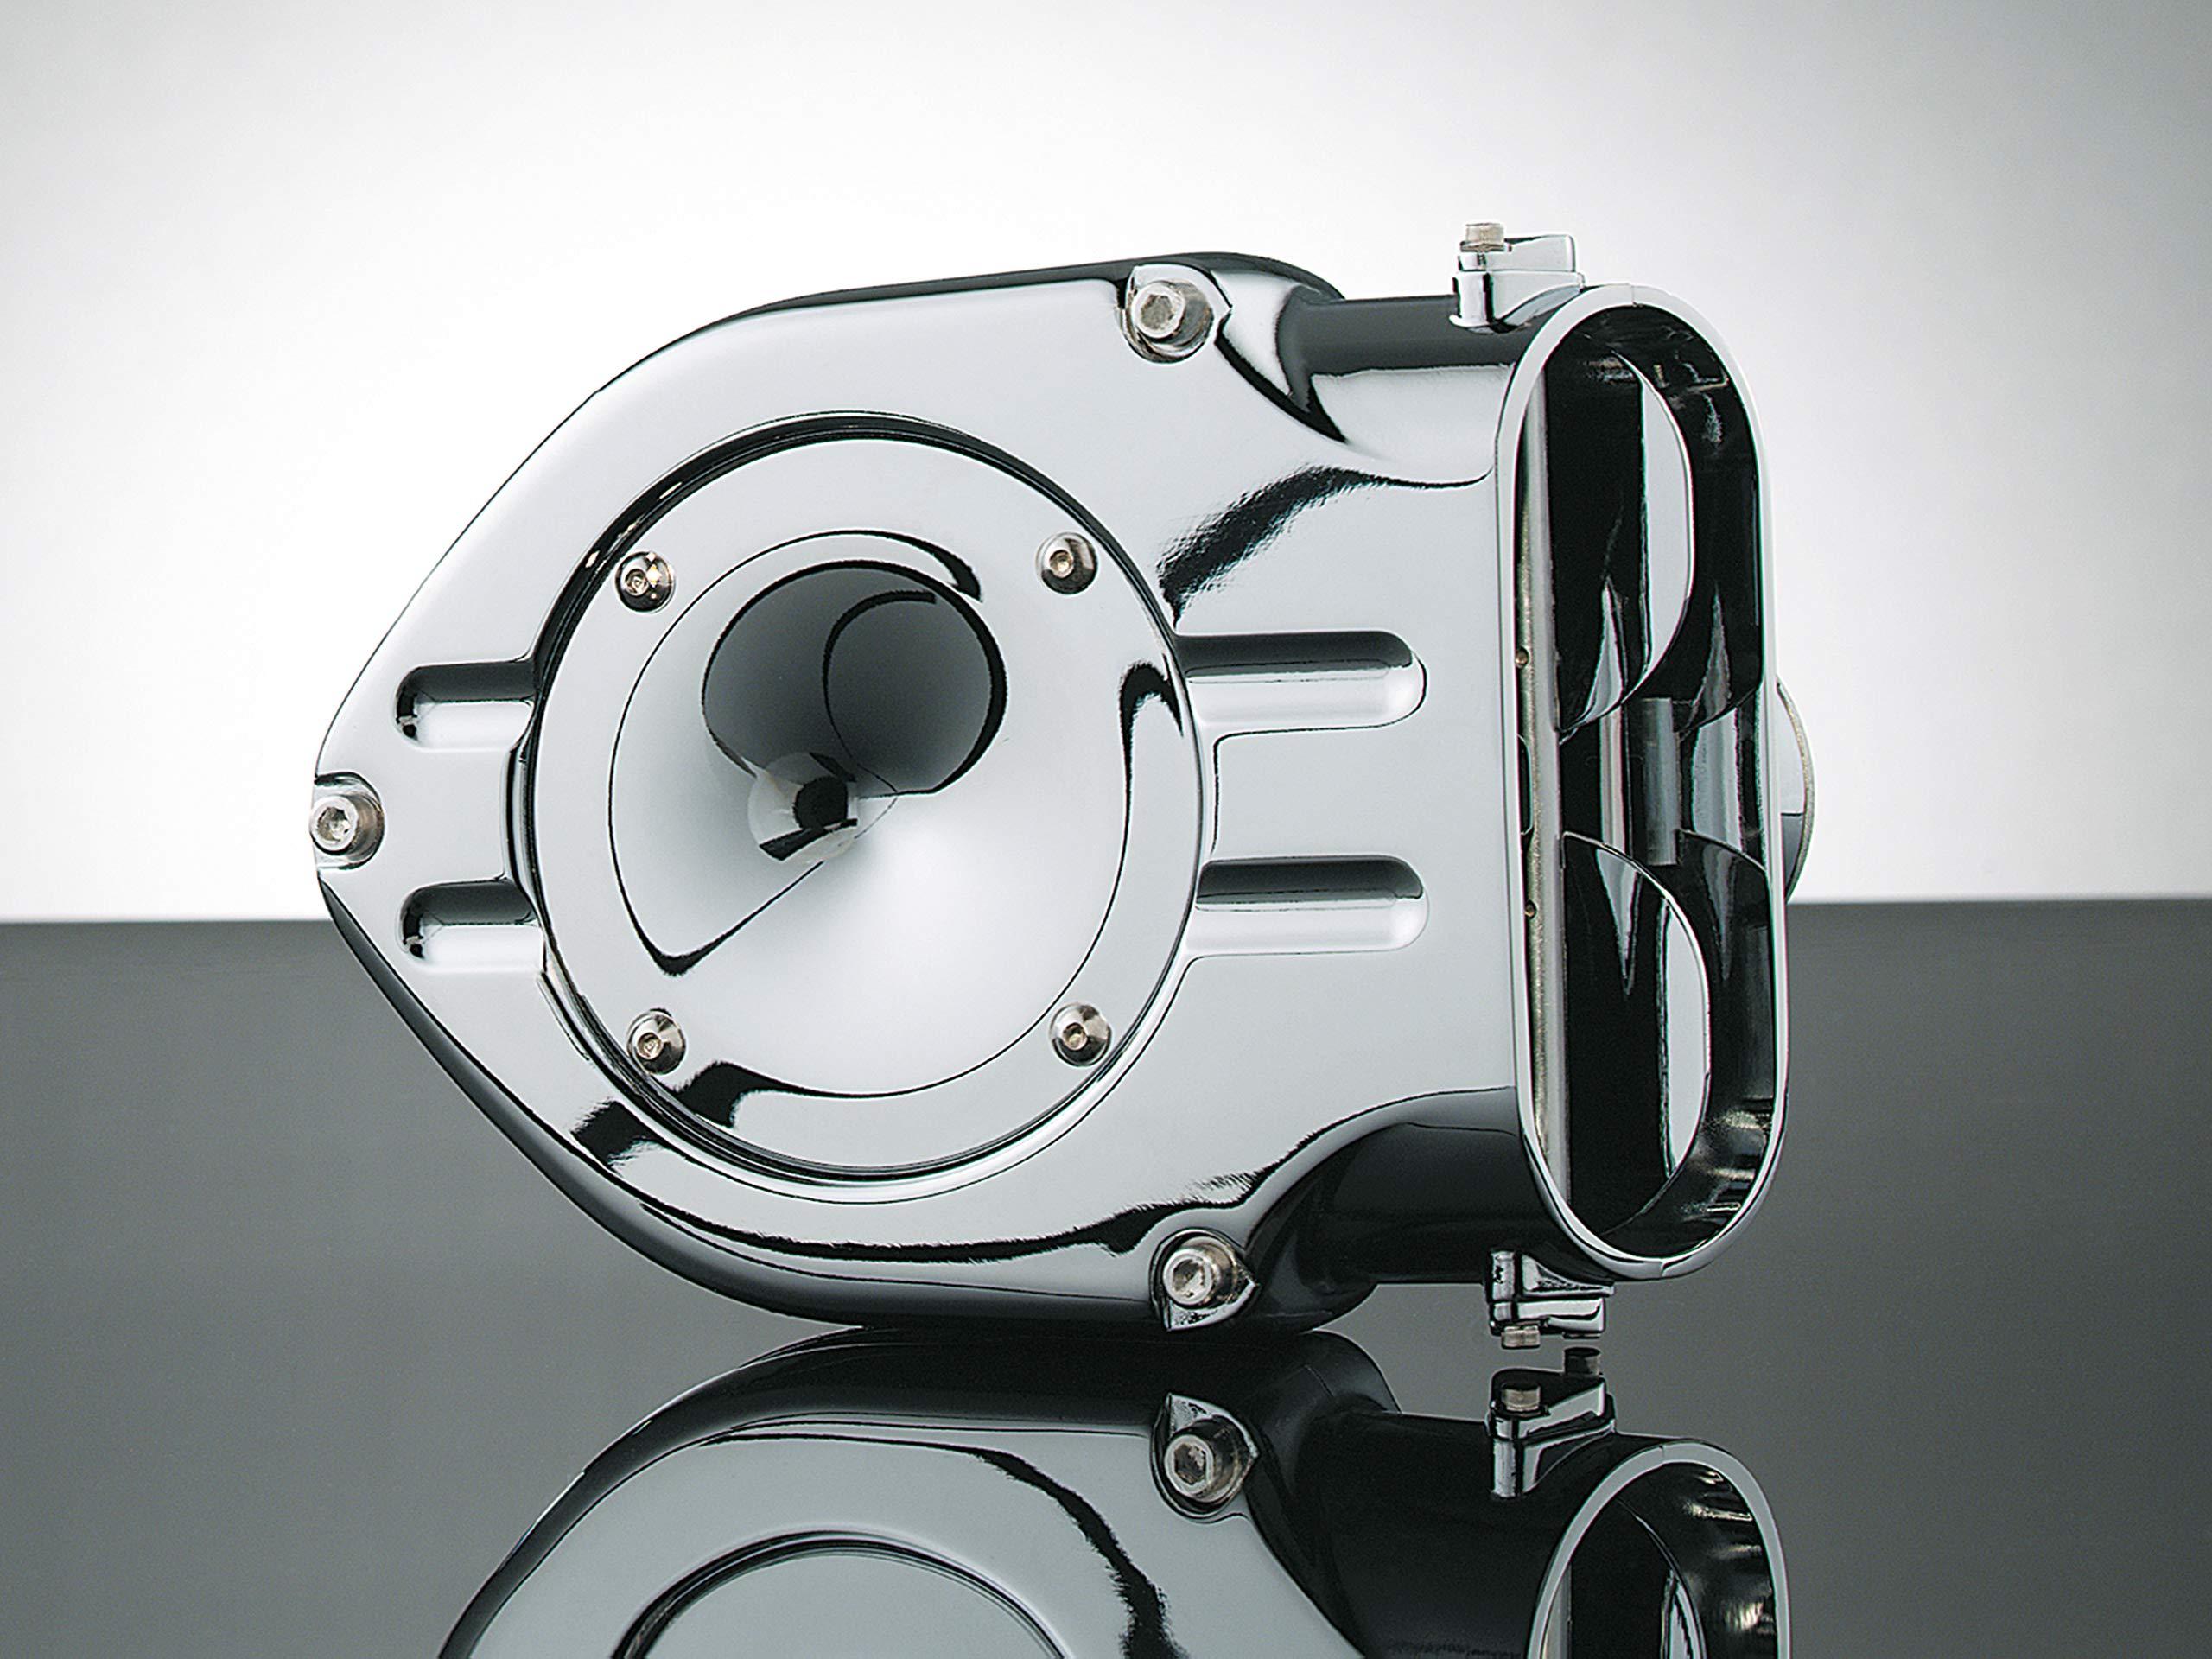 Kuryakyn 9435 Hypercharger Air Cleaner/Filter for Metric Cruisers: 2007-17 Yamaha V Star 1300 Motorcycles, Chrome